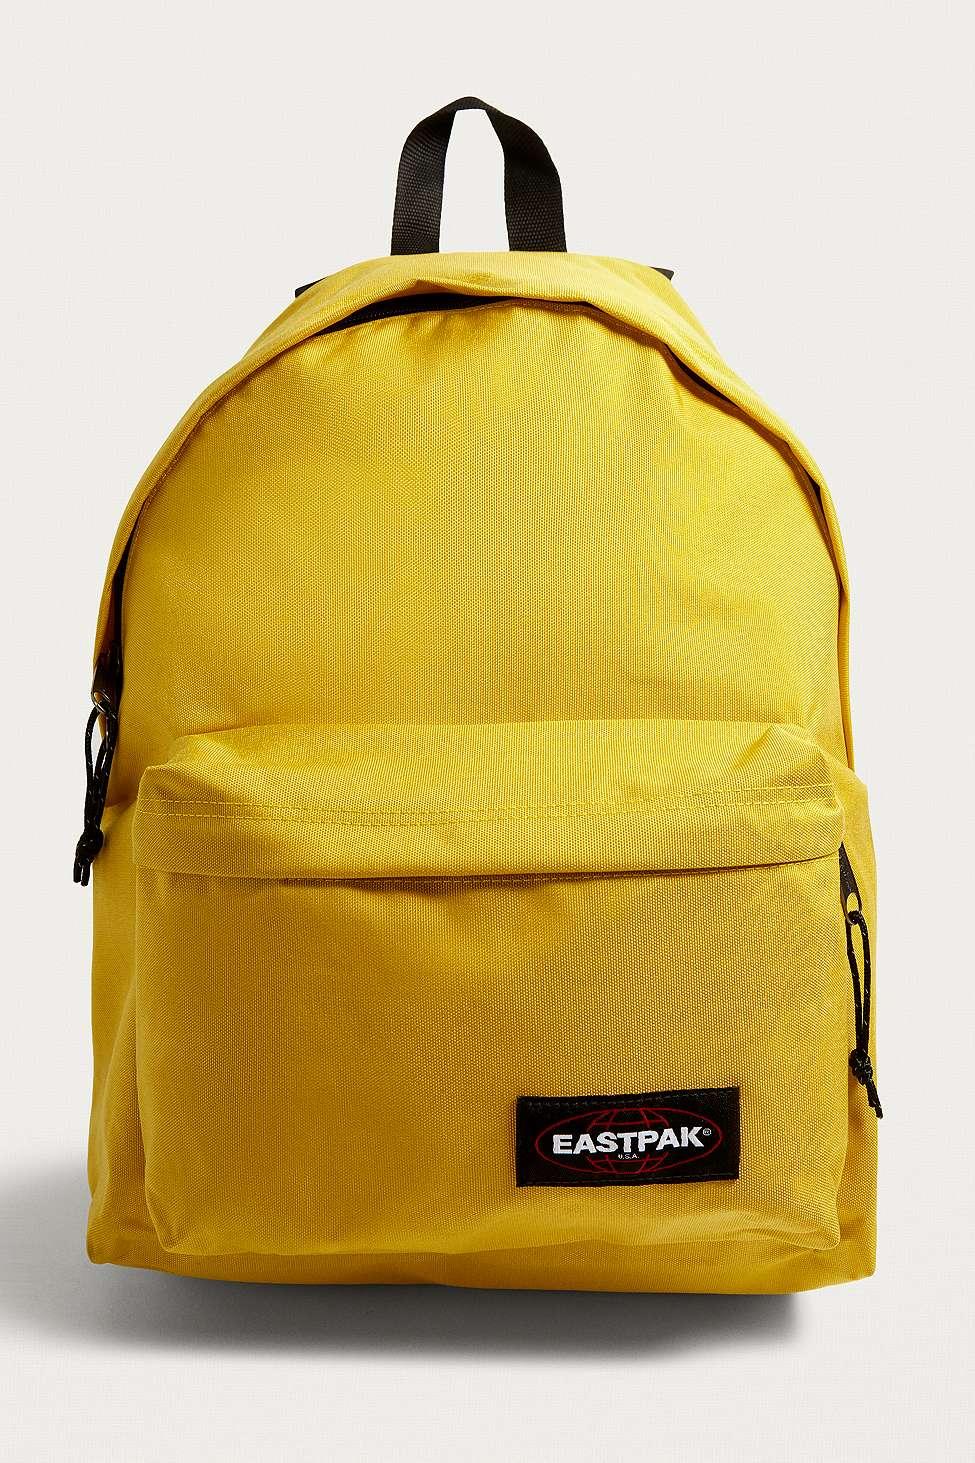 Sacs Eastpak Padded Pak'R jaunes 24L D1WG4z